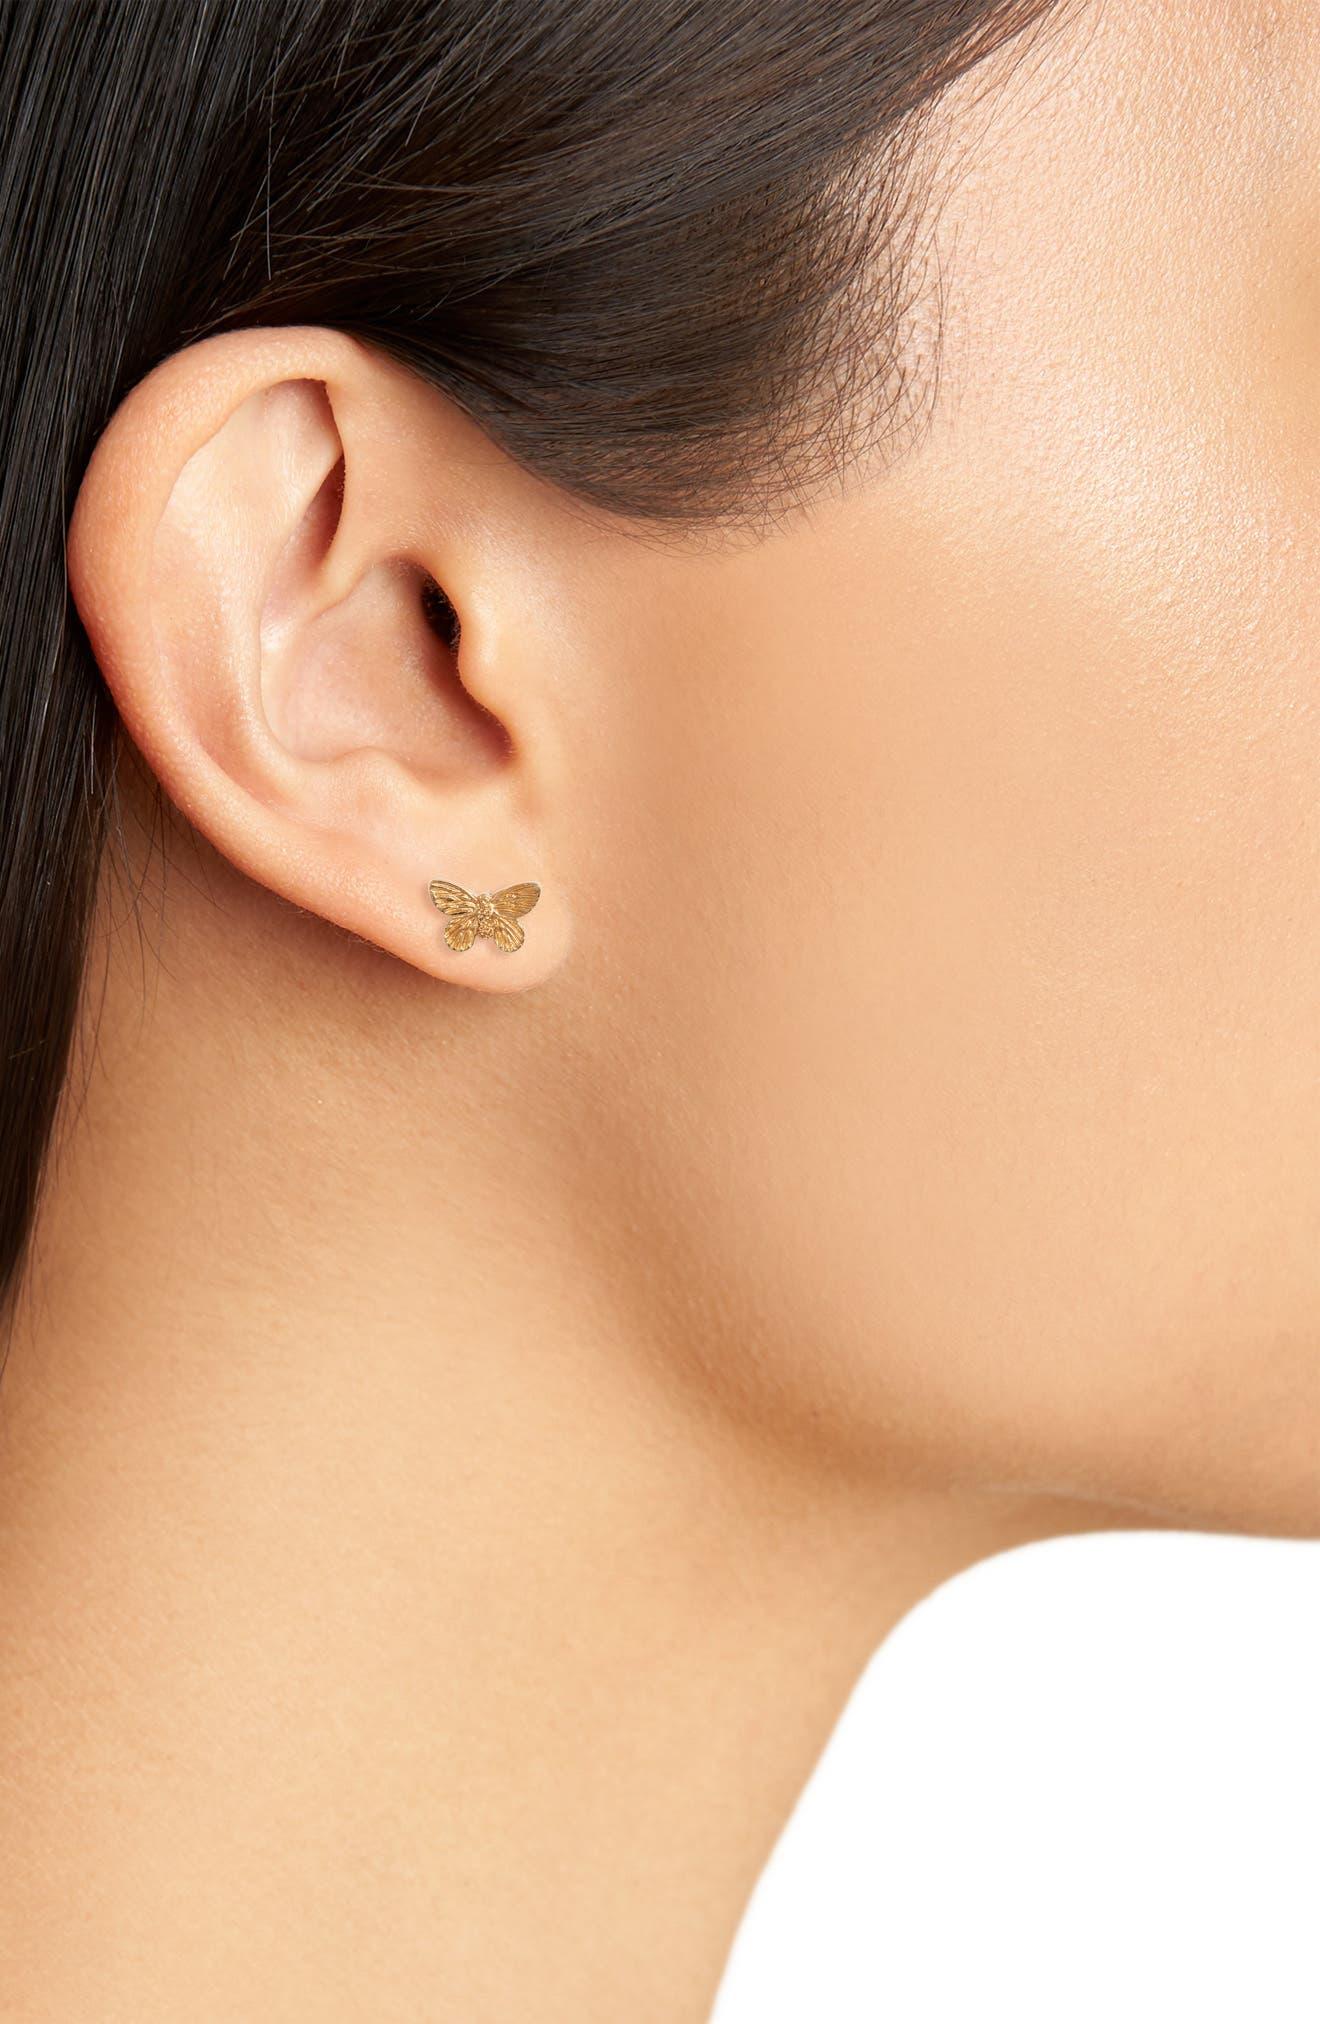 3D Butterfly Stud Earrings,                             Alternate thumbnail 2, color,                             GOLD